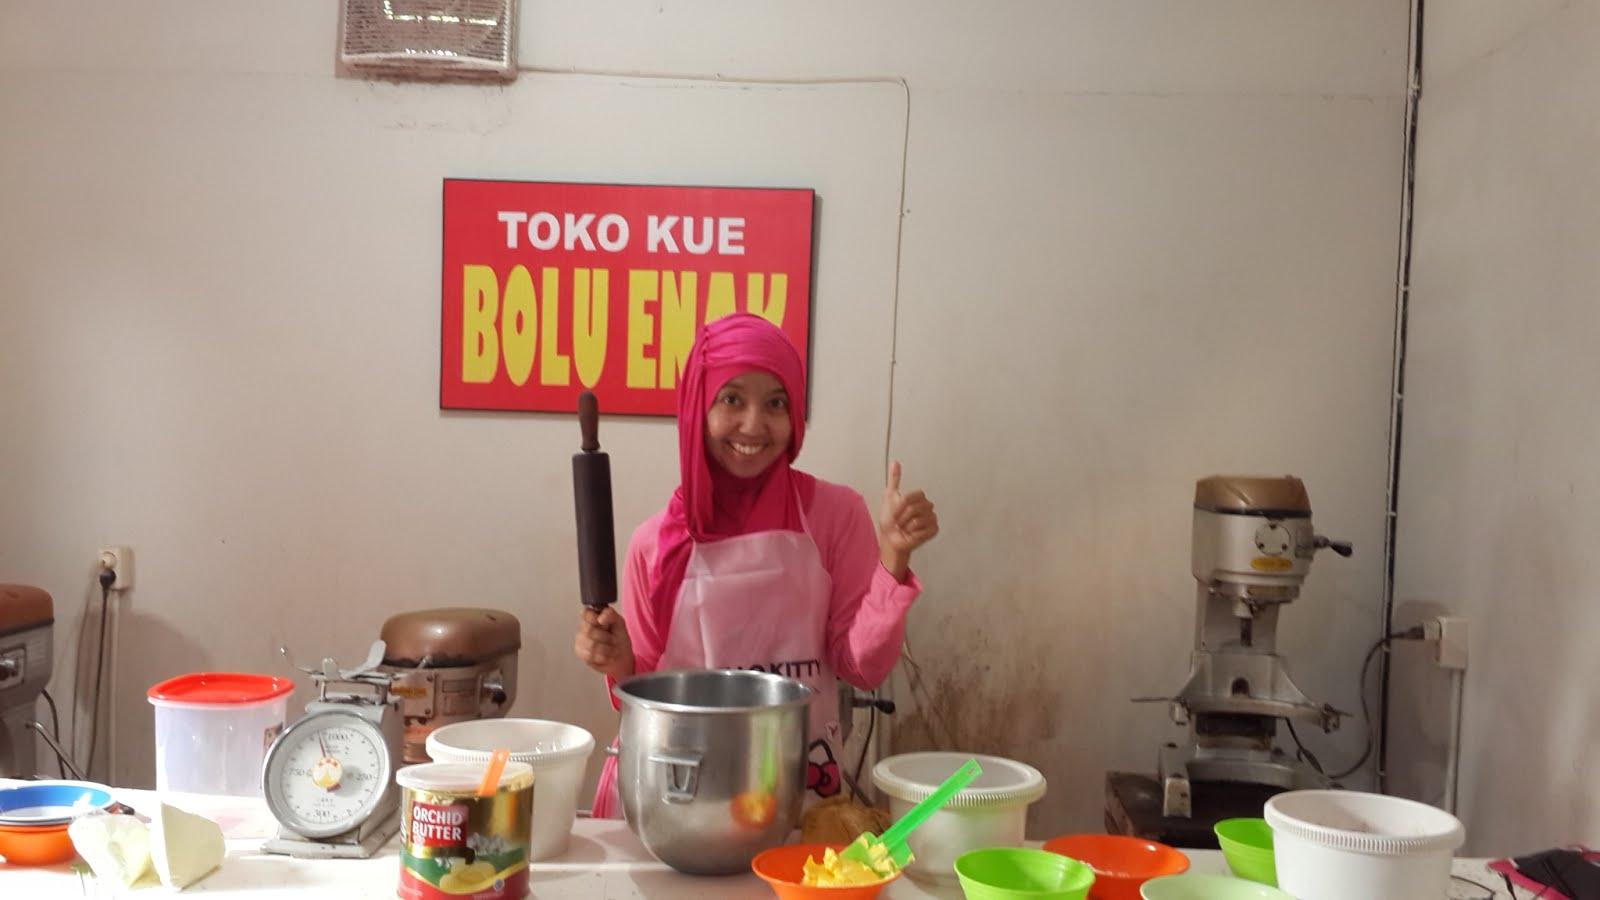 @dapur pusat Toko Kue Bolu Enak